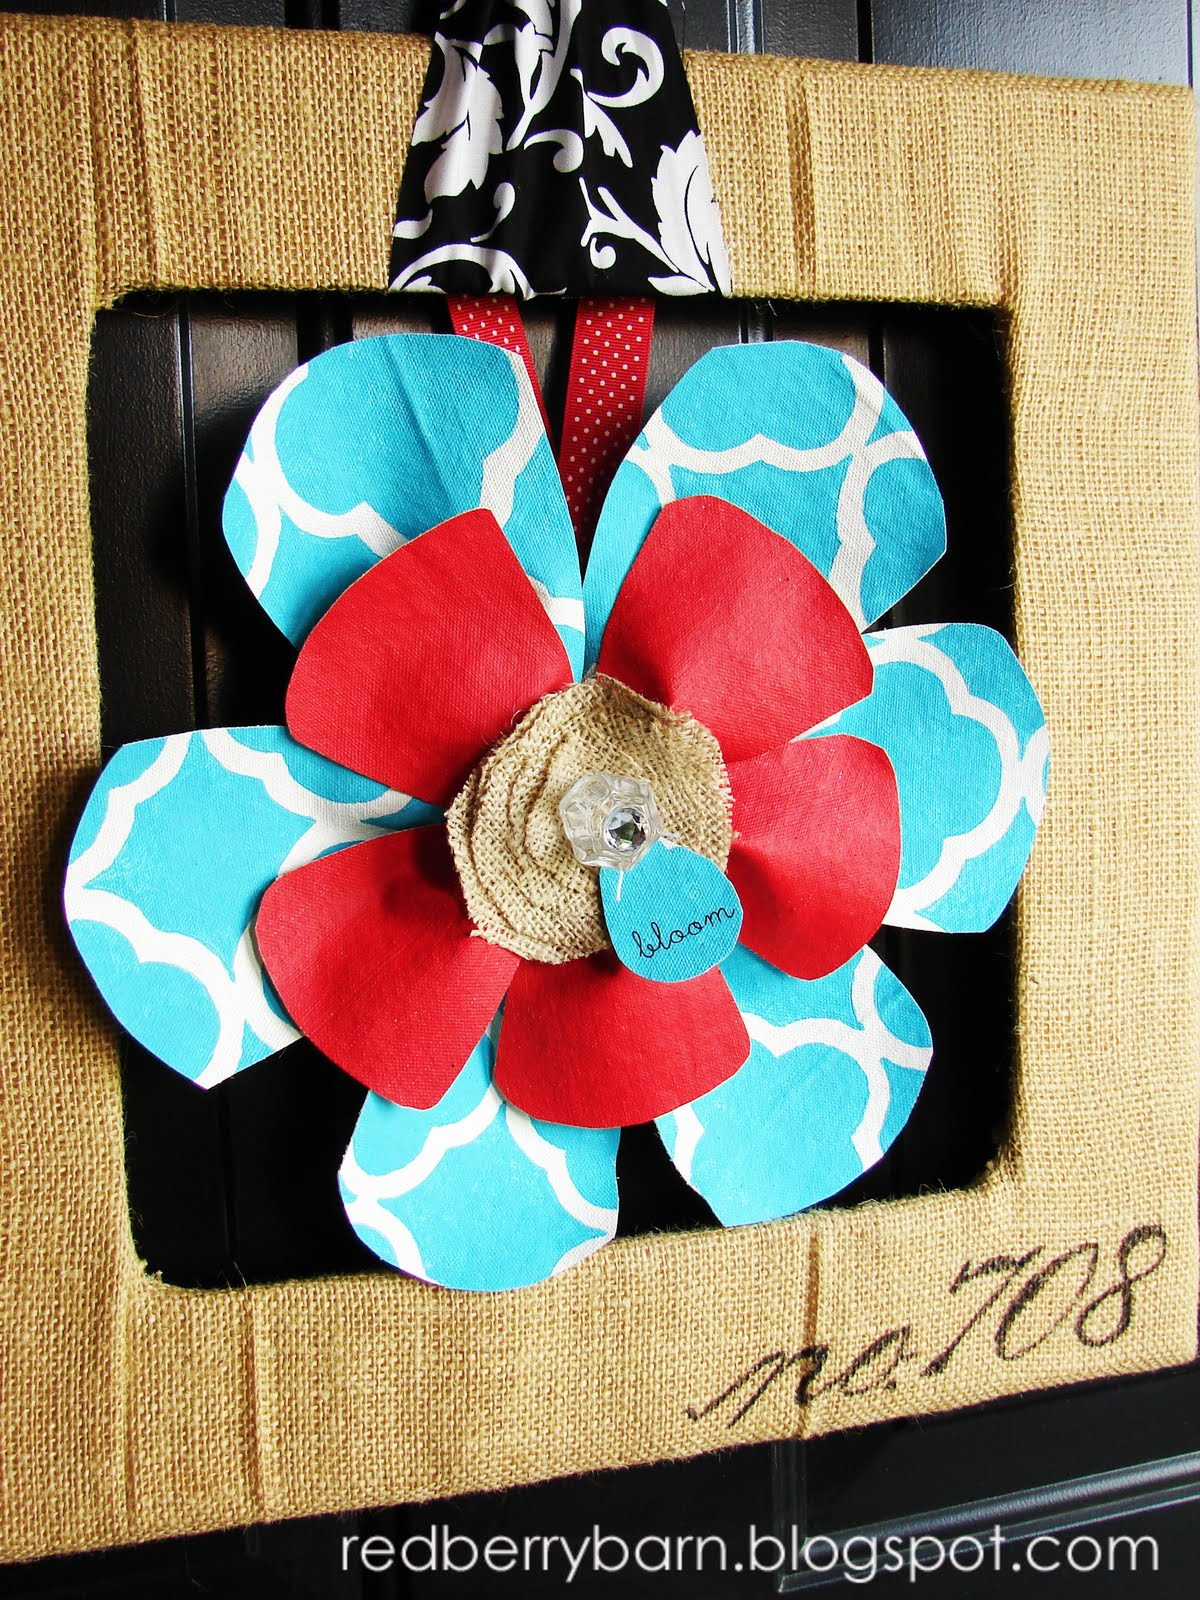 https://i1.wp.com/2.bp.blogspot.com/_5R1cHzQOAsI/S_2nSUBda0I/AAAAAAAADxI/4Tv4kJyWpkg/s1600/flower+side.jpg?resize=419%2C559